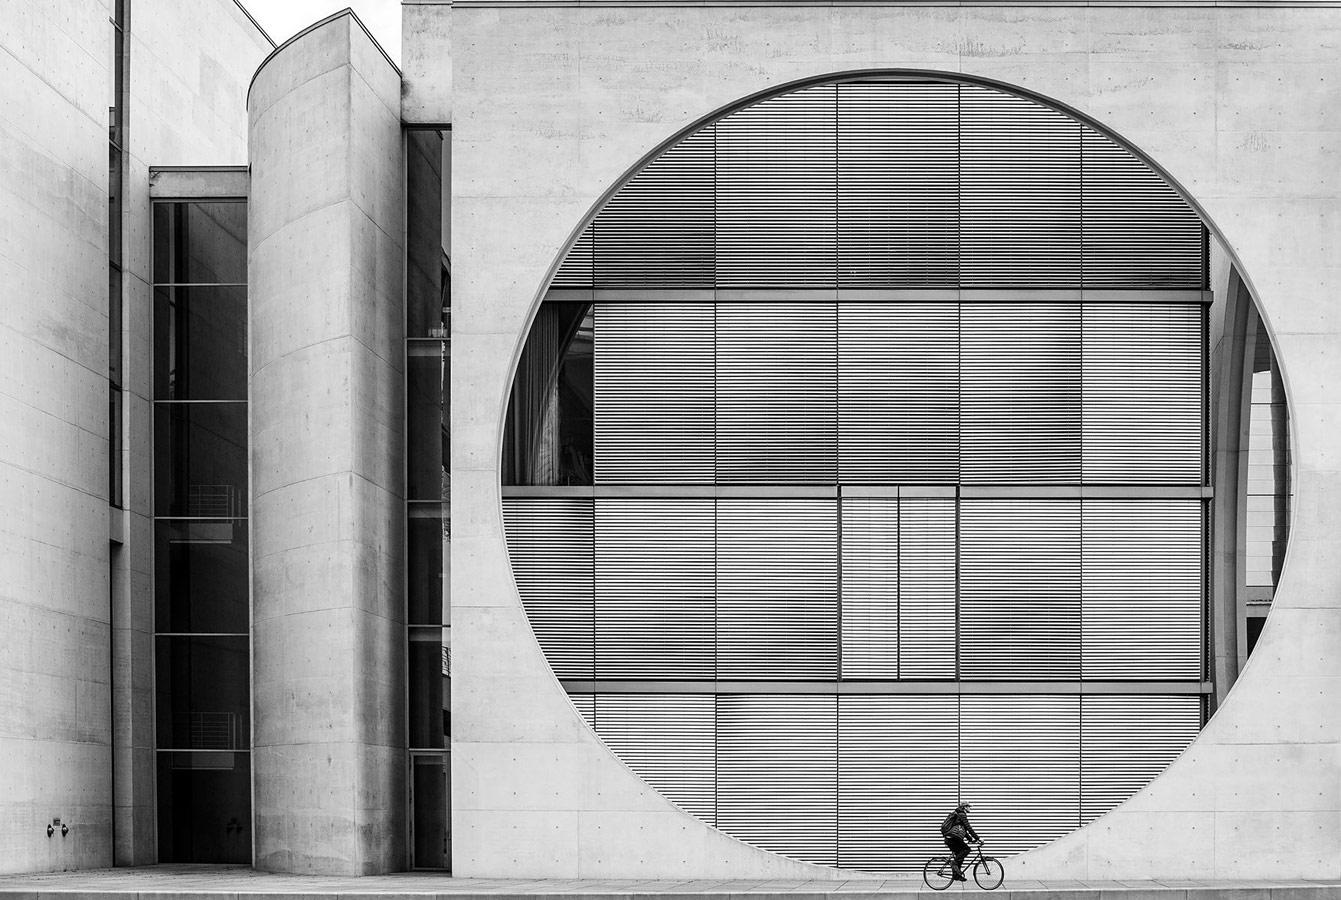 Вэнпенг Лу, Франция / Wenpeng Lu, France, 3-е место в категории «Архитектура и городское пространство», Фотоконкурс Siena International Photography Awards